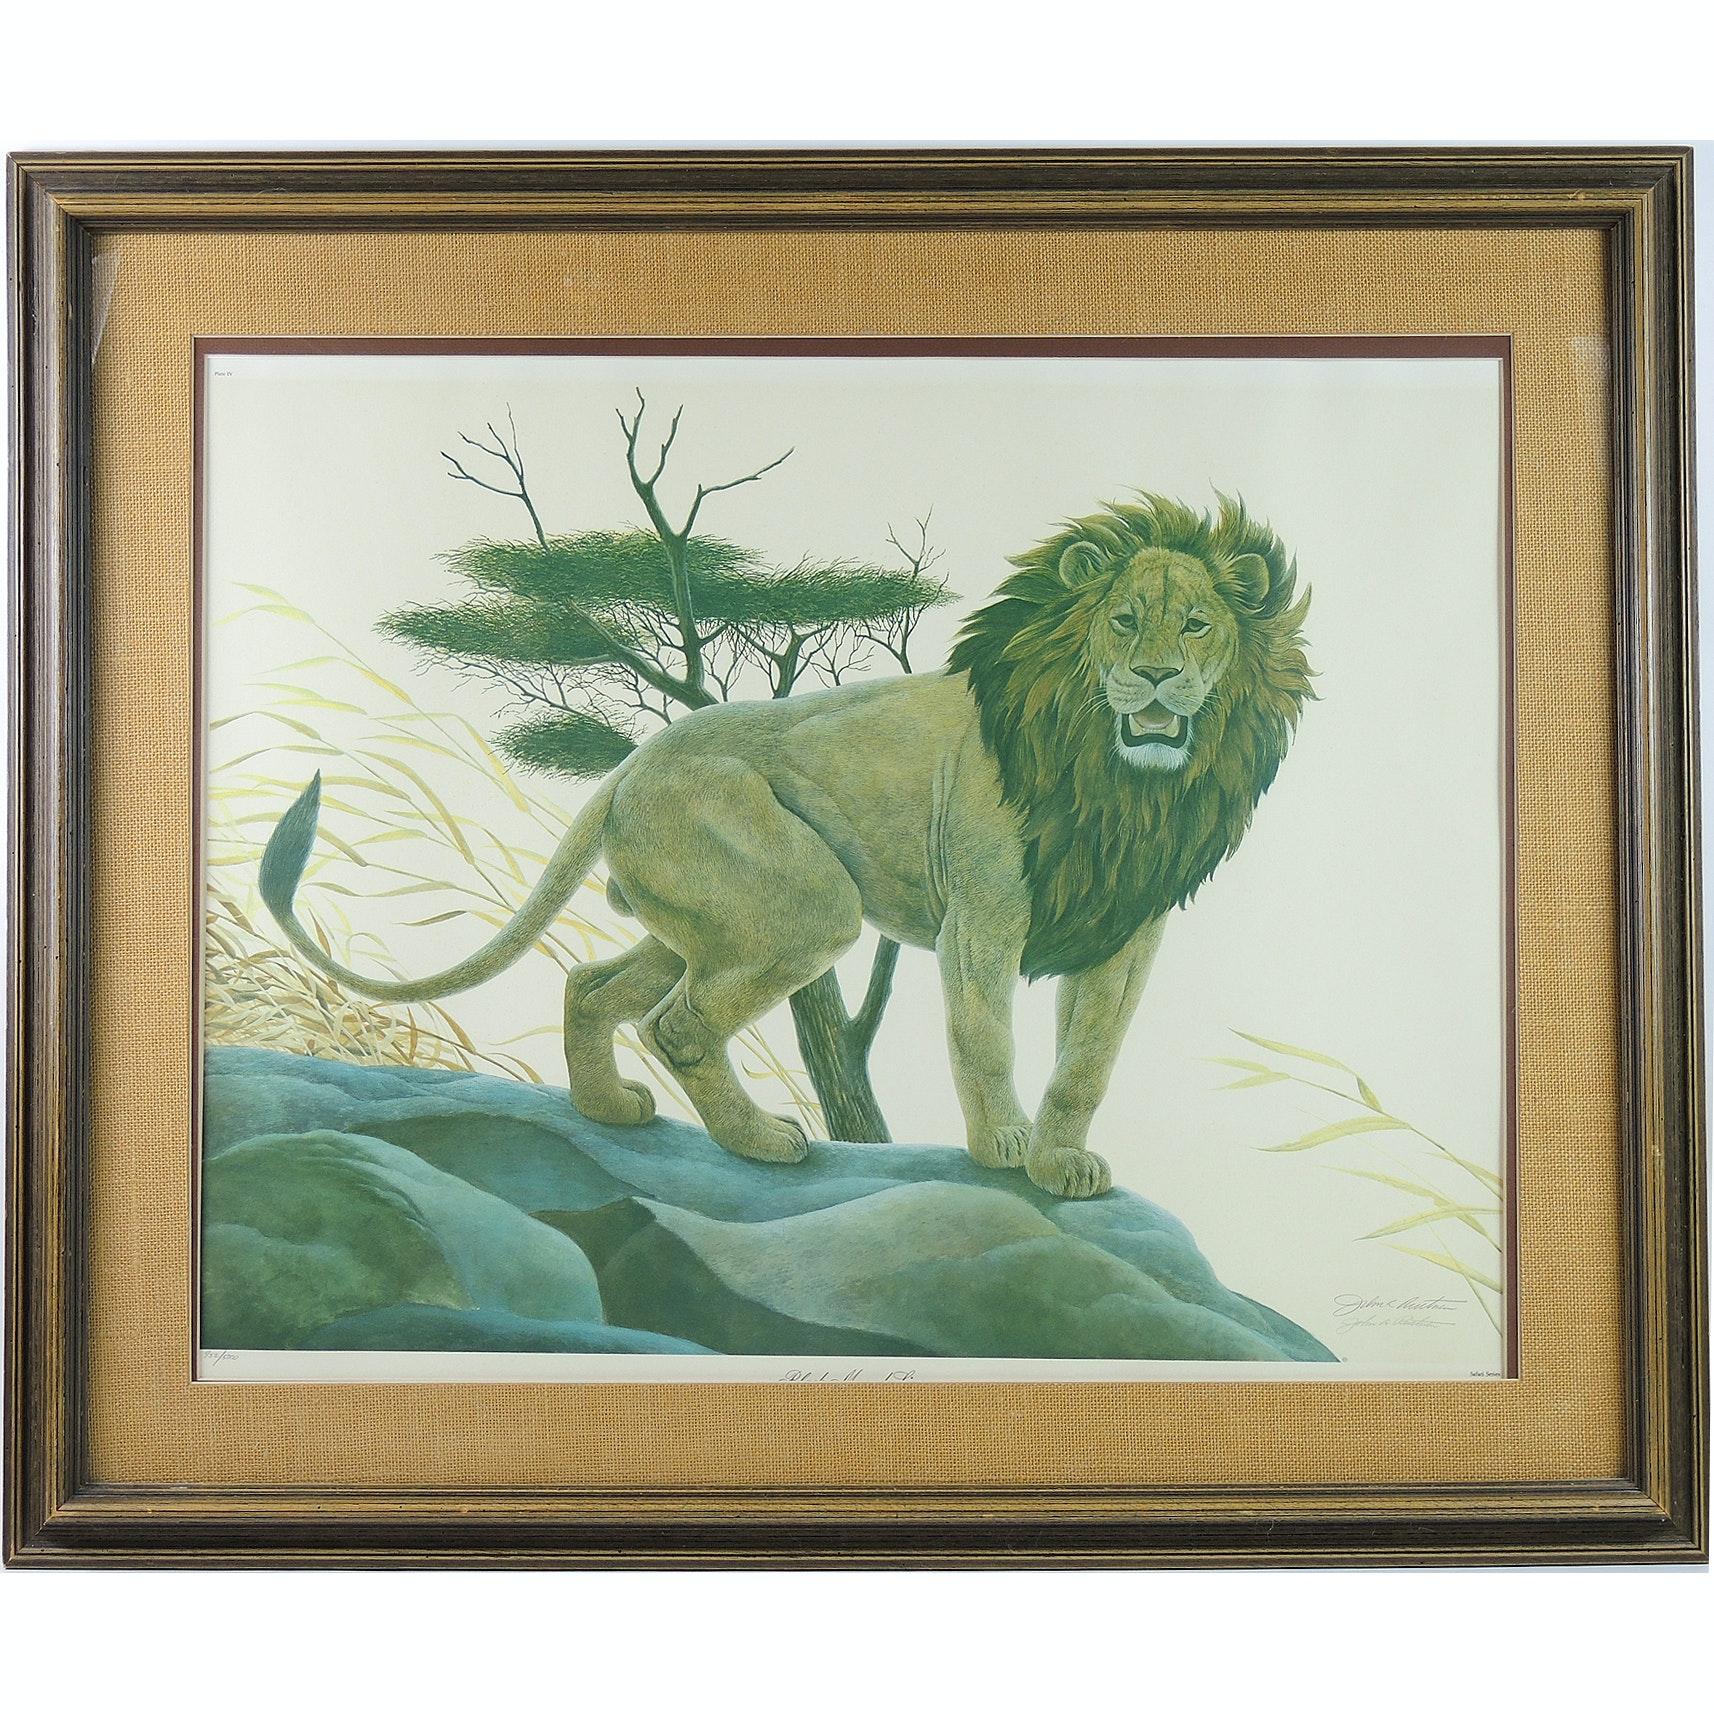 "John Ruthven Limited Edition Offset Lithograph ""Black Maned Lion"""